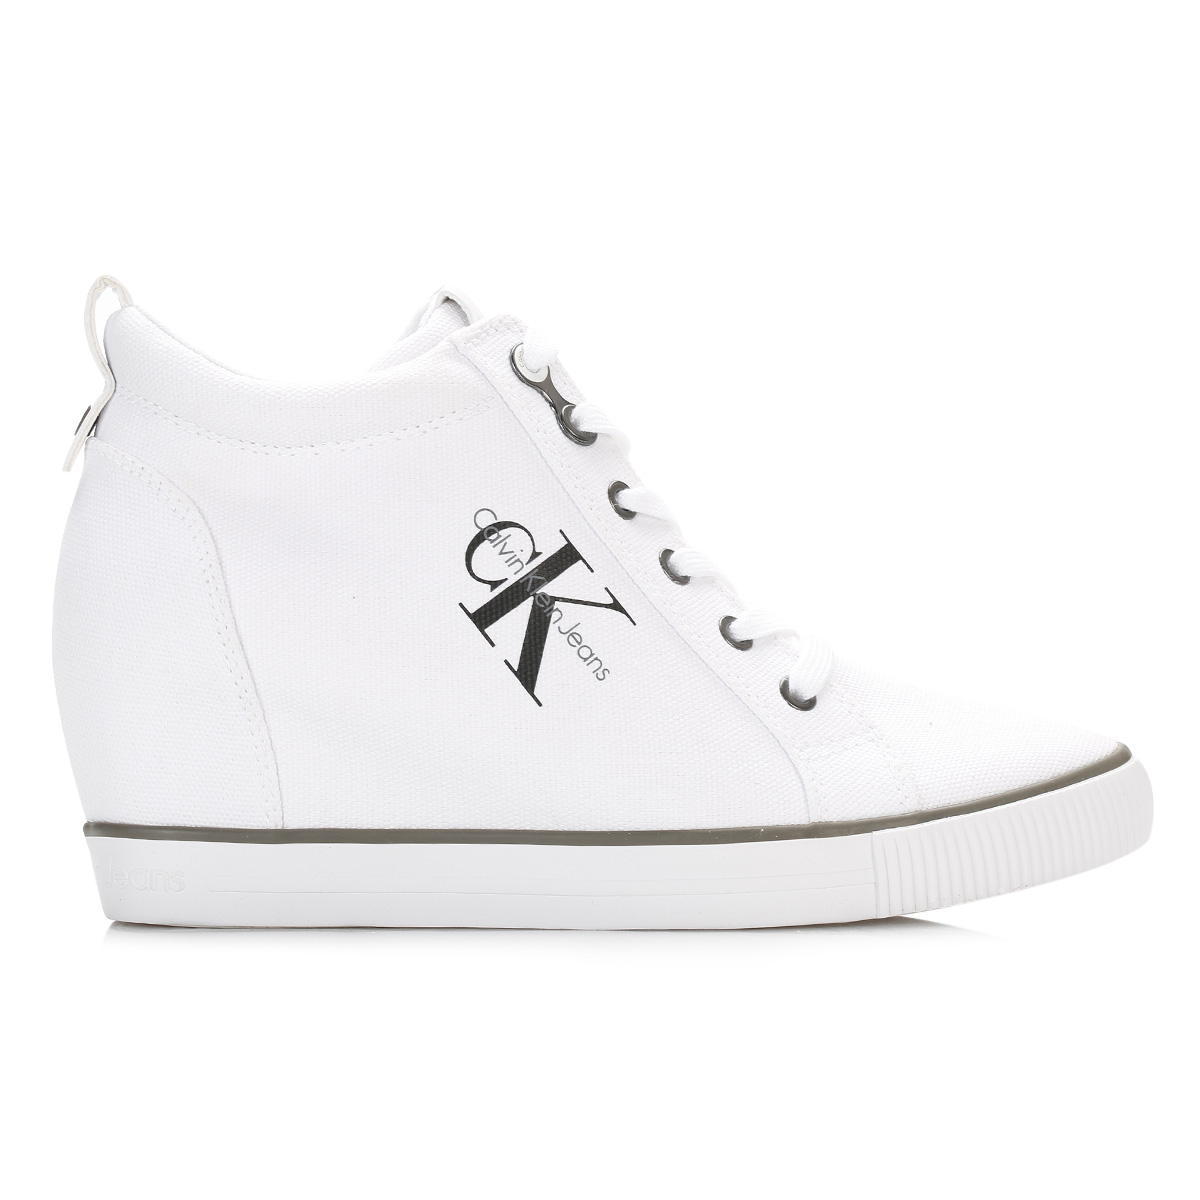 calvin klein shoes online australian furniture association of pa